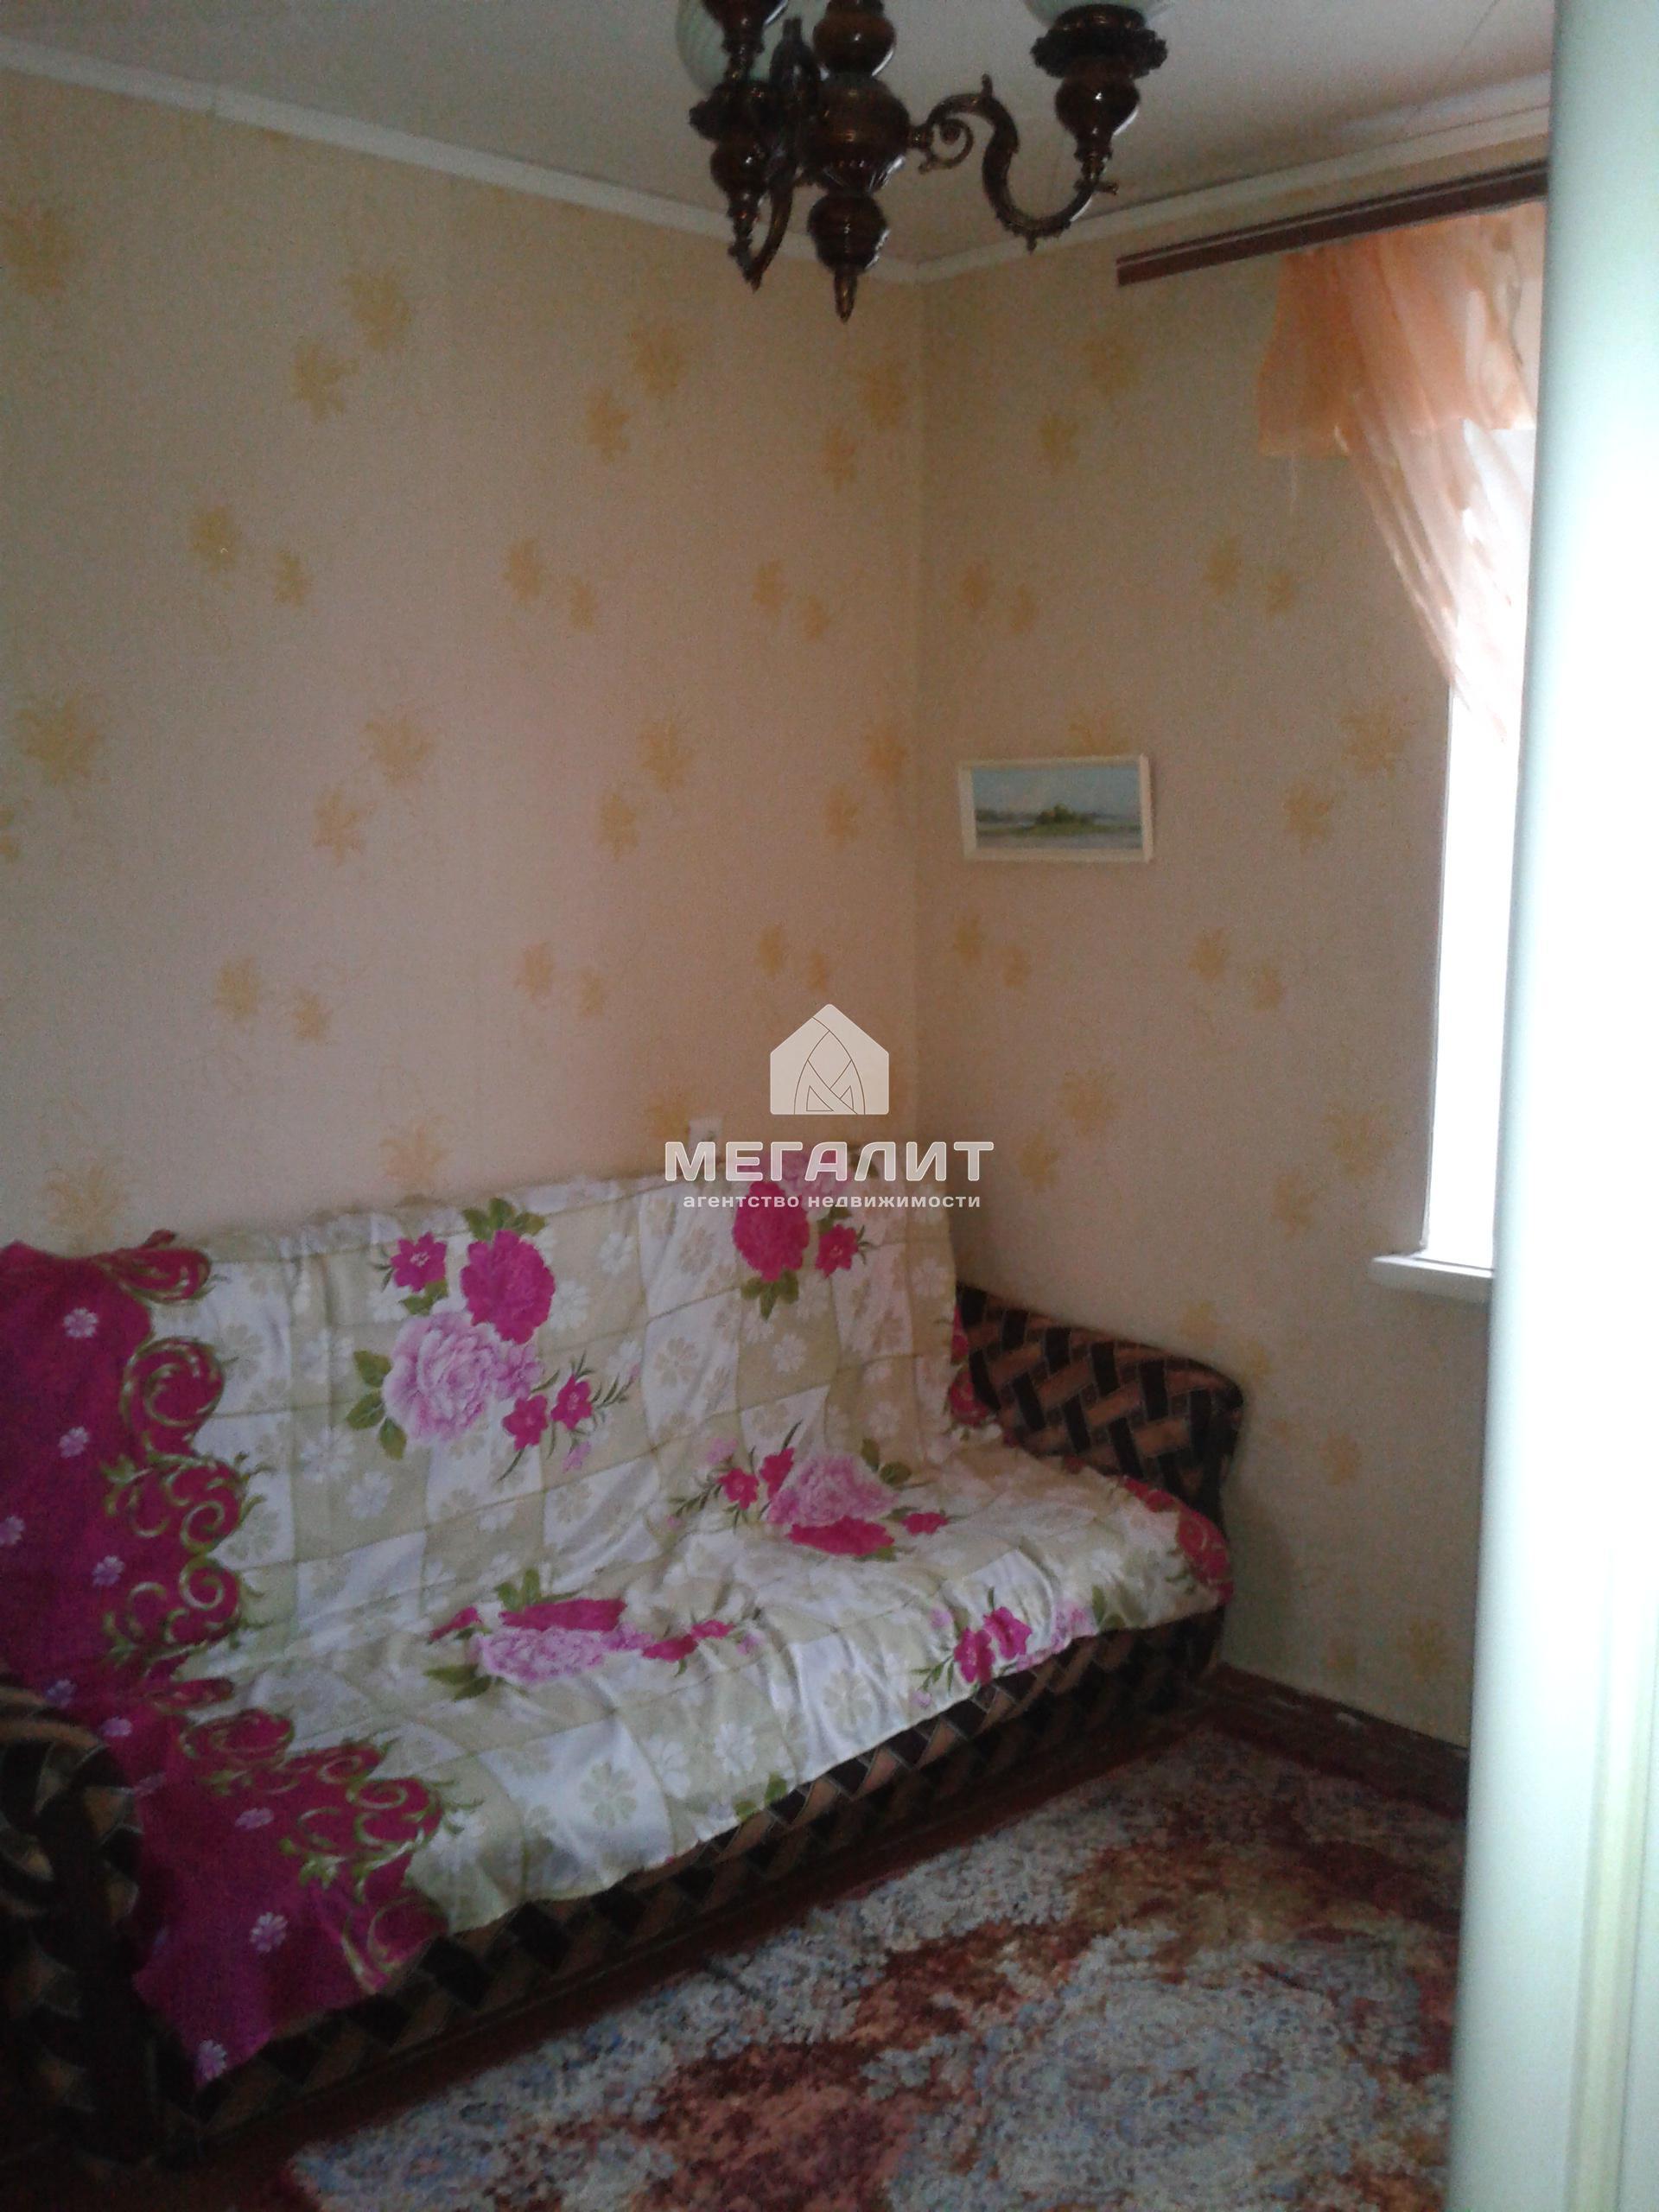 Аренда  комнаты Короленко 52а, 100.0 м² (миниатюра №1)